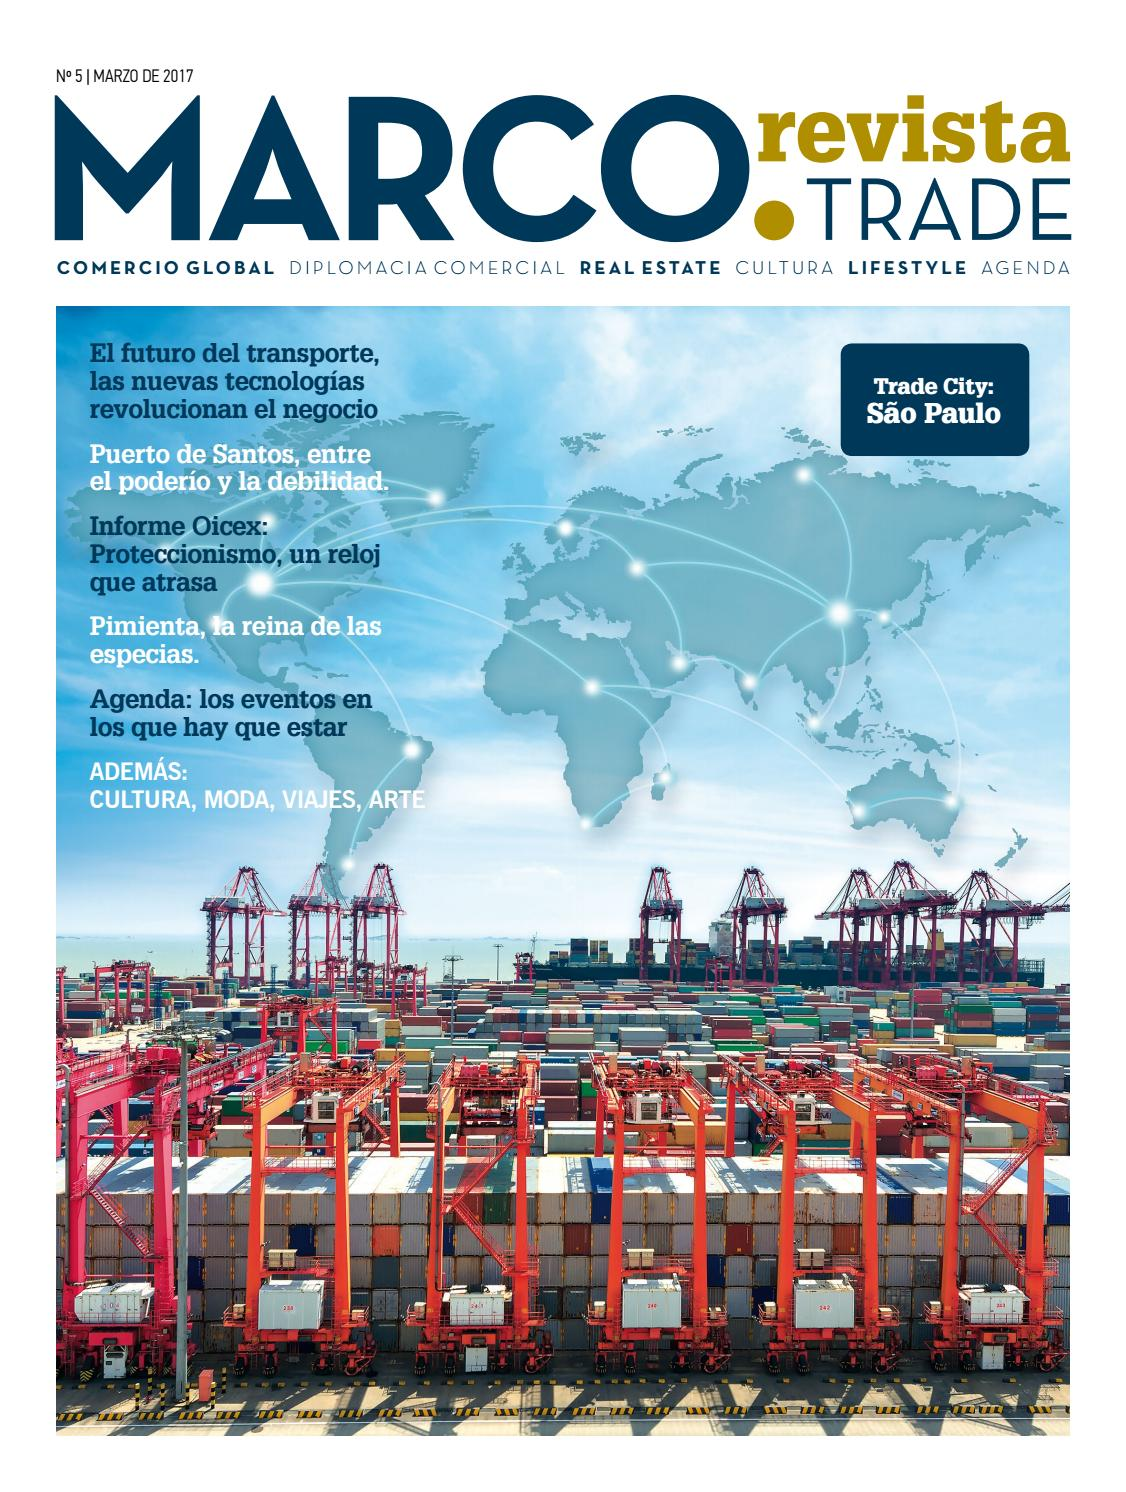 Marco Trade Revista Numero 5 by MARCO TRADE REVISTA - issuu